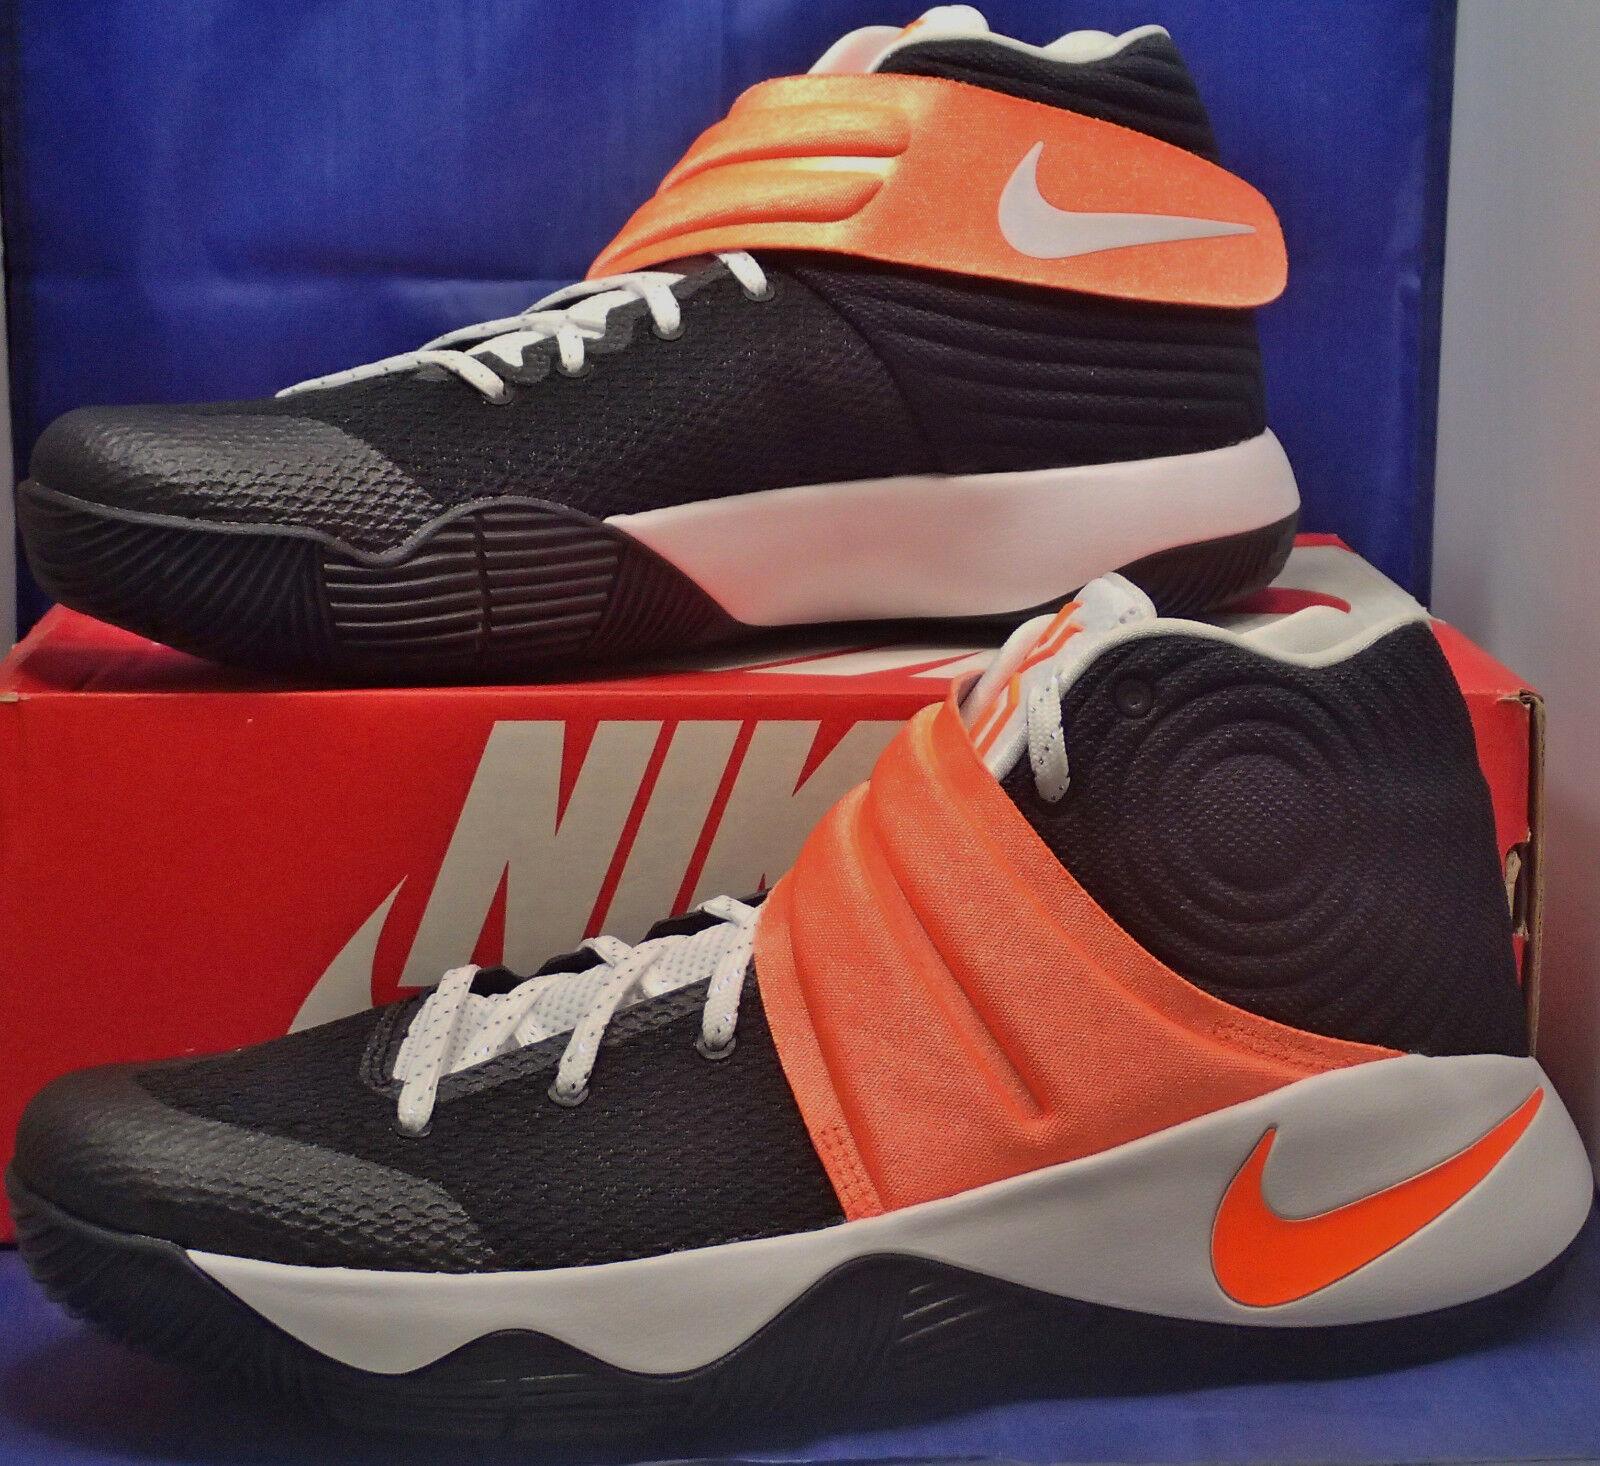 Nike kyrie 2 id bianca arancia sz 11,5 (843253-998)   caratteristica    Scolaro/Signora Scarpa